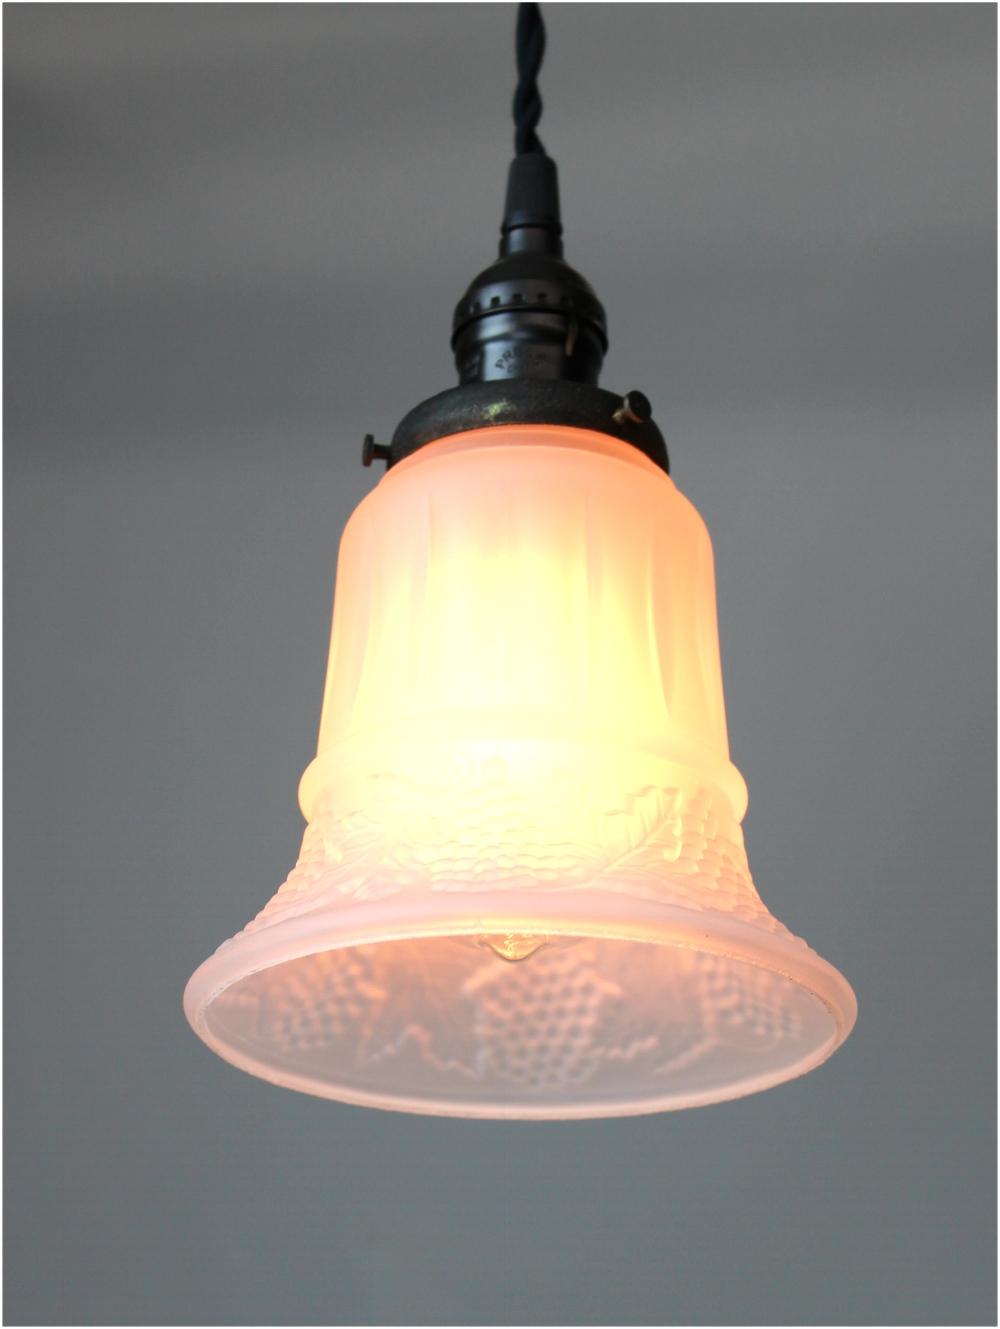 Satin Glass Shade 2 1 4 Fitter Size Pendant Light Fixture